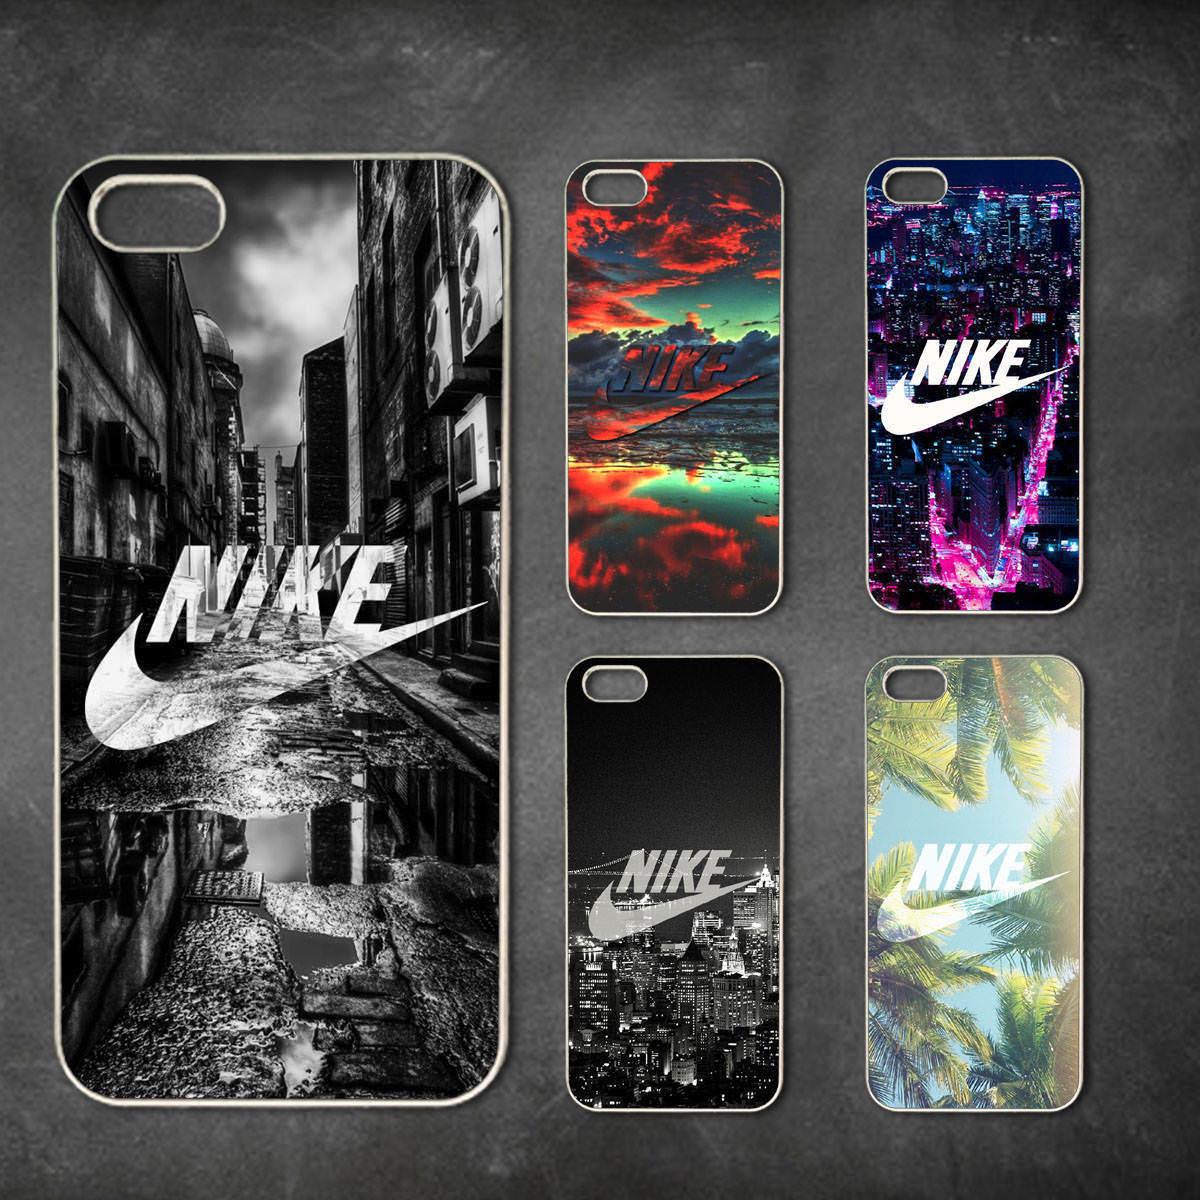 32 kinds Nike Iphone 7 case iphone 5 5s 5c 6 plus 6 8 7+ 8+